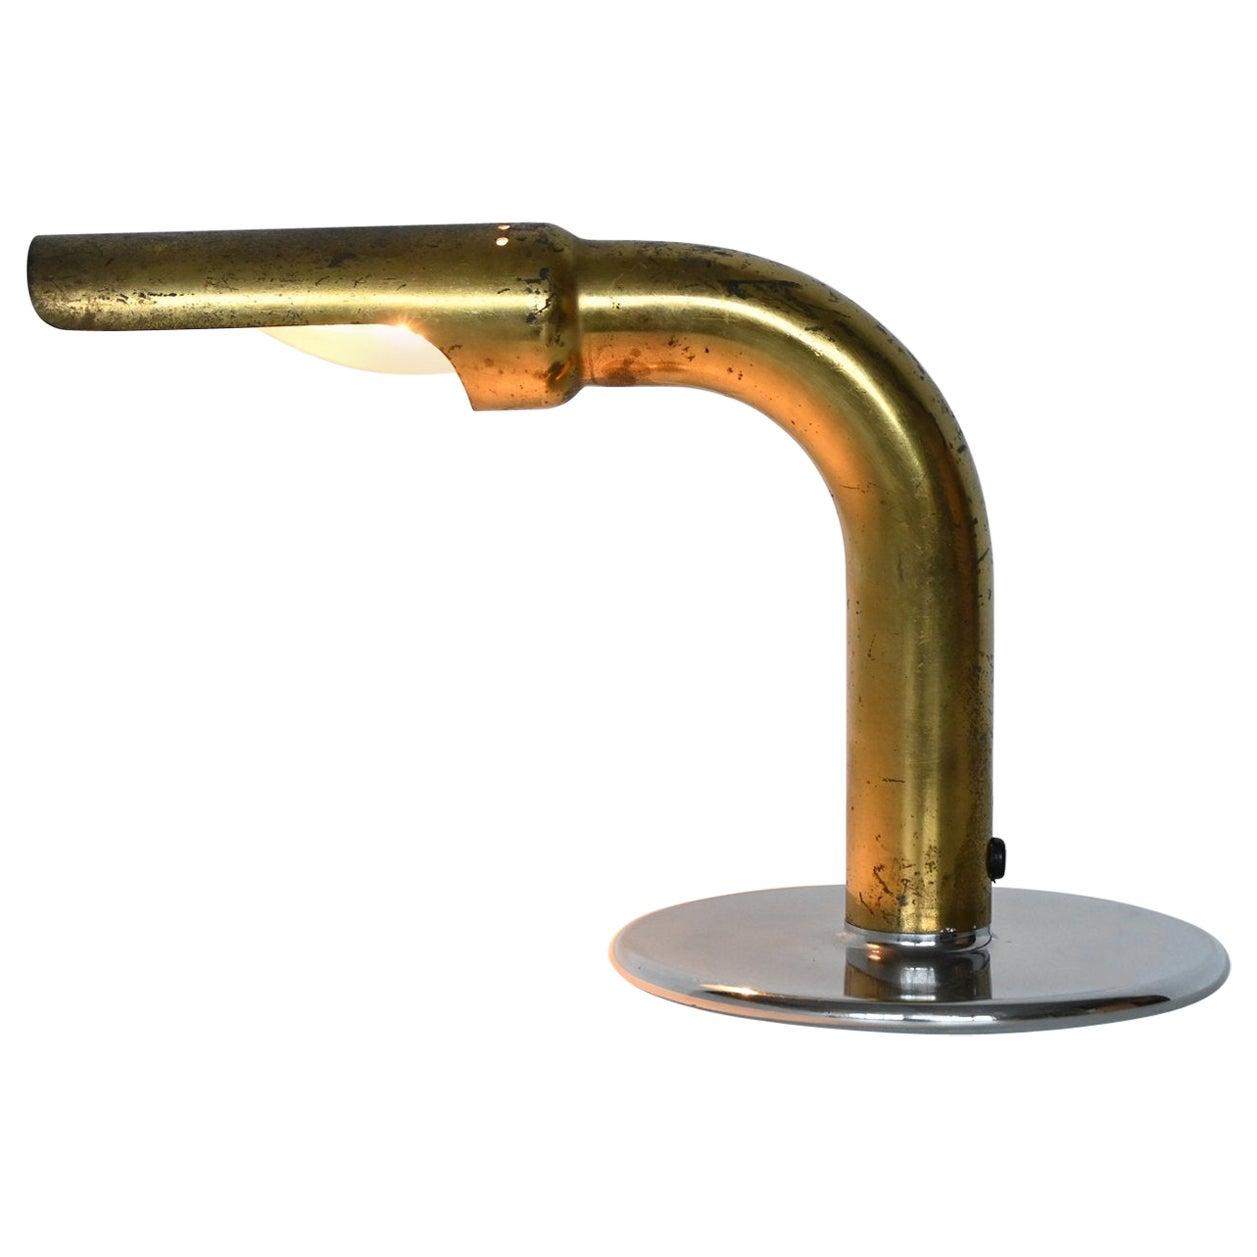 Ingo Maurer Gulp Desk Lamp M Design, Germany, 1970